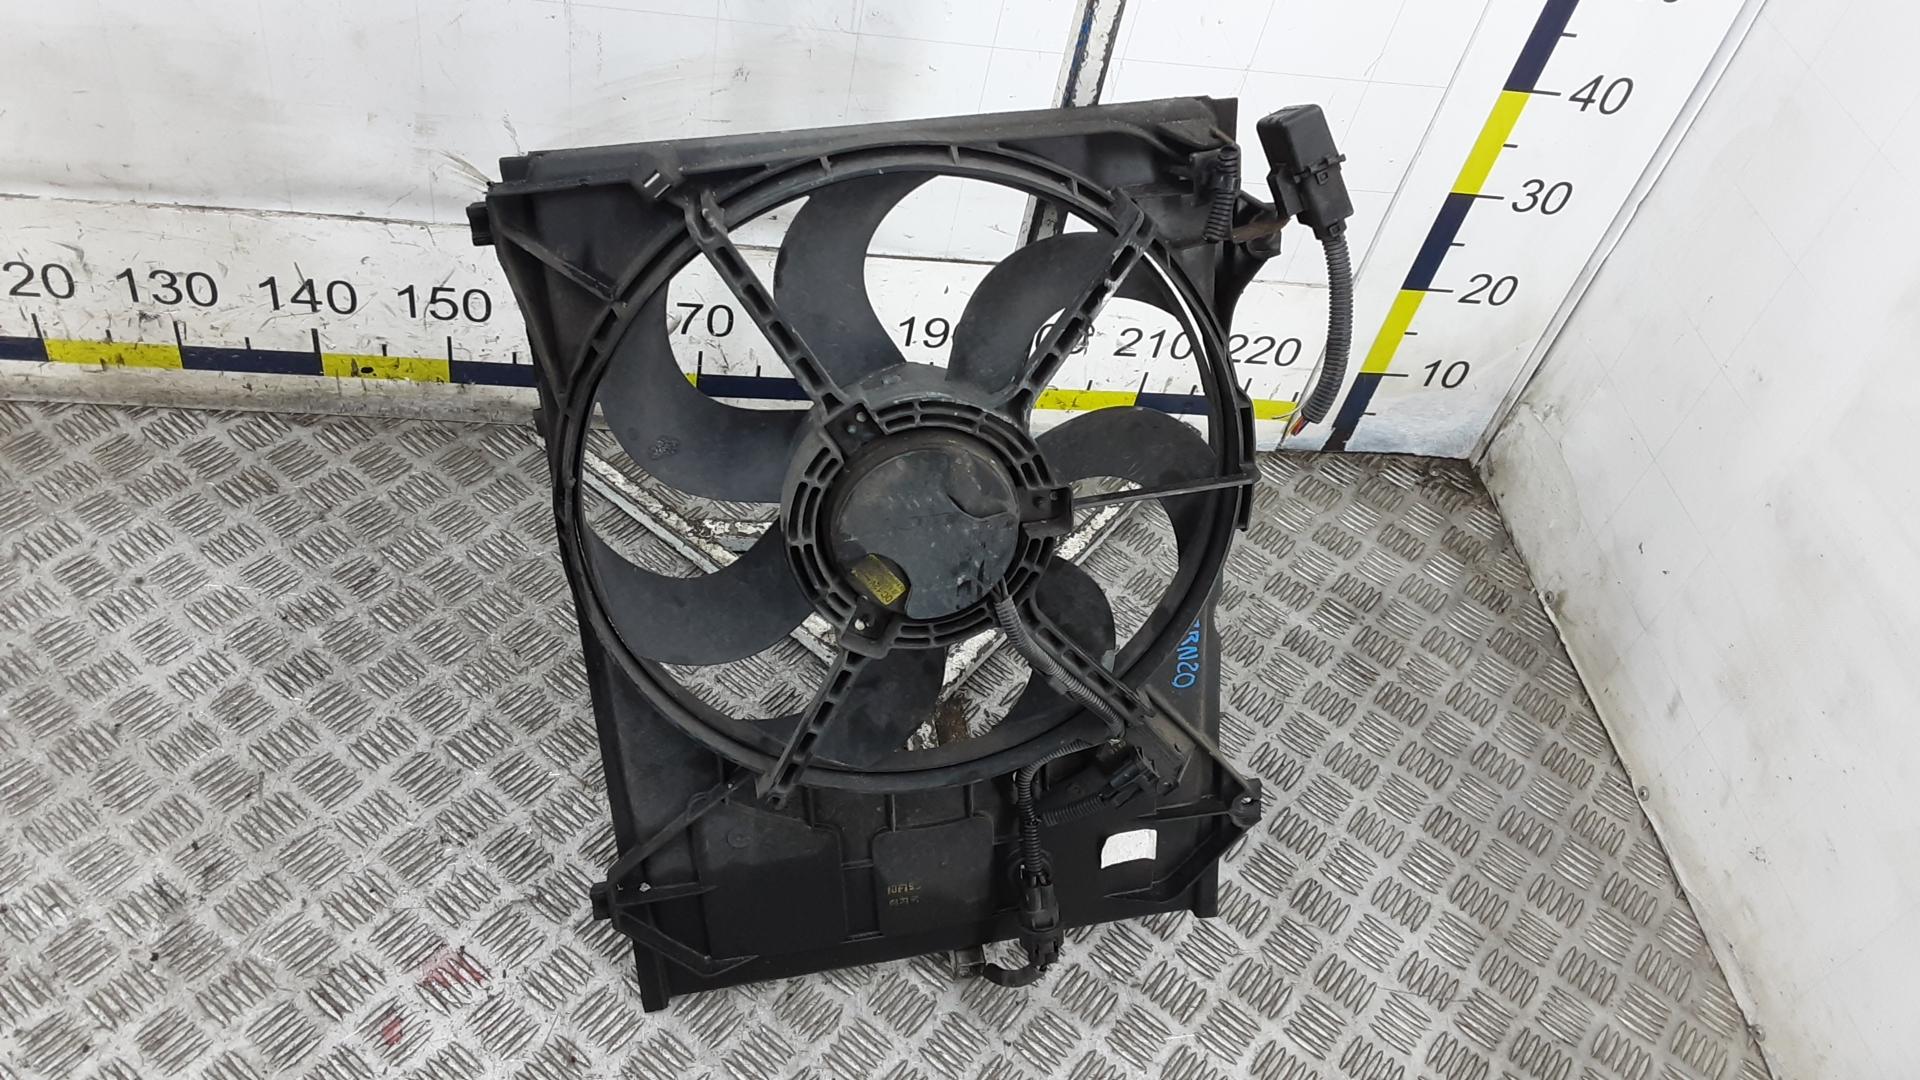 Вентилятор радиатора, KIA, RIO 2, 2010